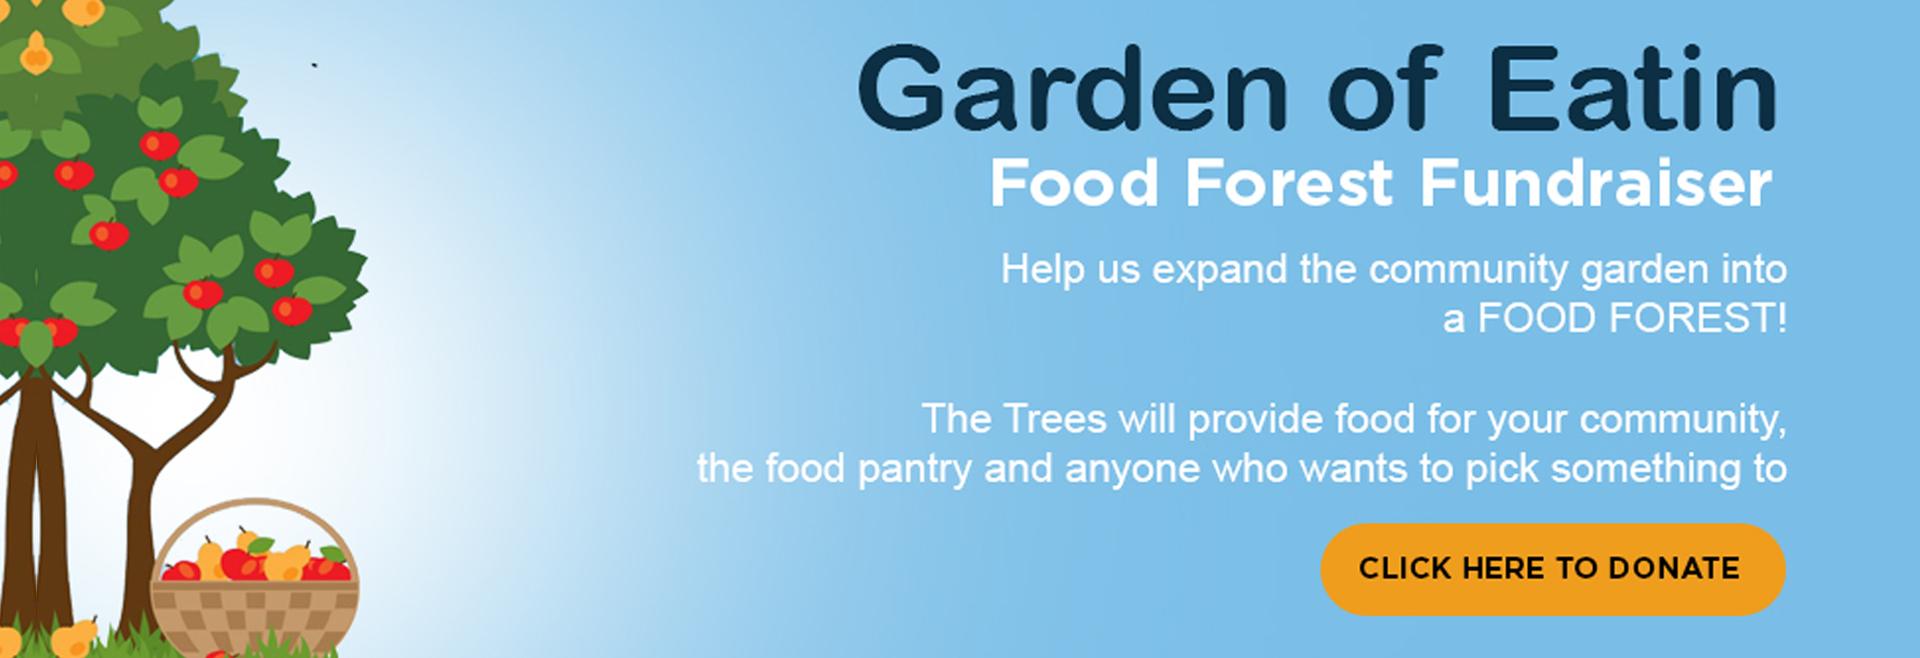 Garden-Eatin-Banner